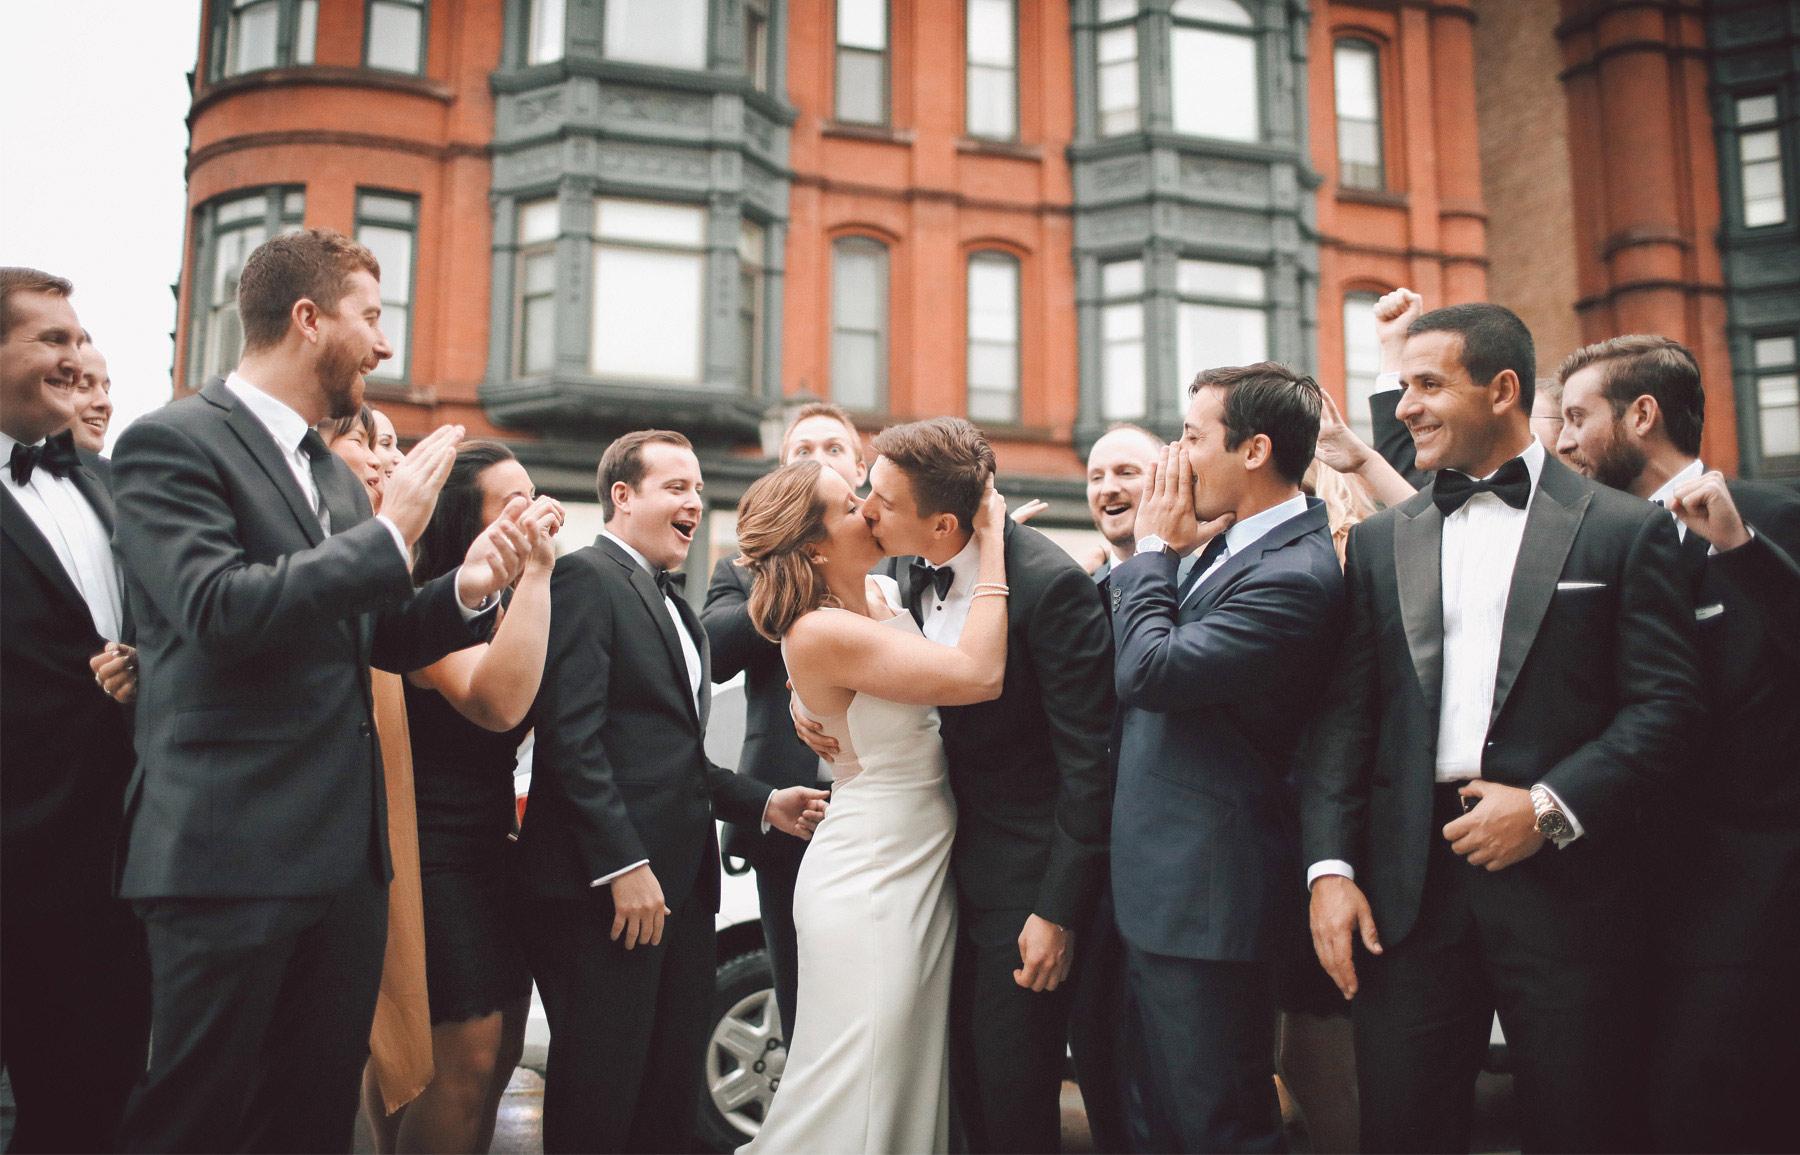 16-Saint-Paul-Minnesota-Wedding-Photographer-by-Andrew-Vick-Photography-Fall-Autumn-Bride-Groom-Bridal-Party-Groomsmen-Bridesmaids-Kiss-Vintage-Kathryn-and-Sam.jpg